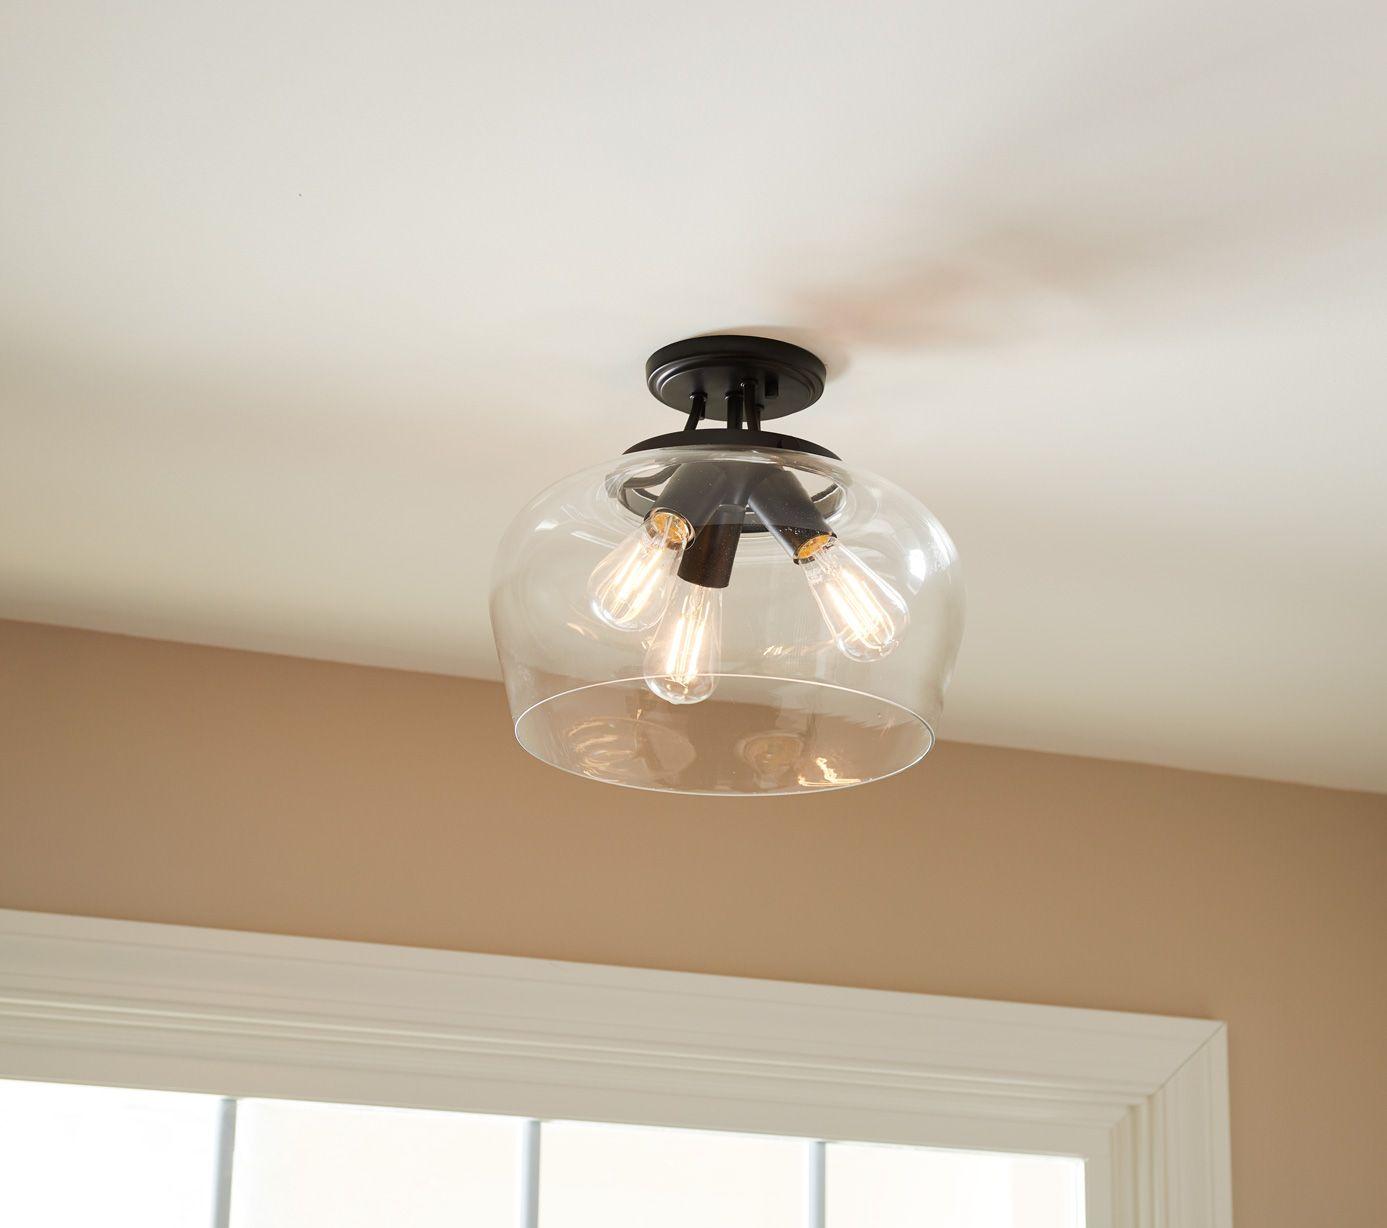 Savoy House Octave 3 Light Semi Flush Ceiling Light In Black In 2020 Ceiling Lights Semi Flush Ceiling Lights Ceiling